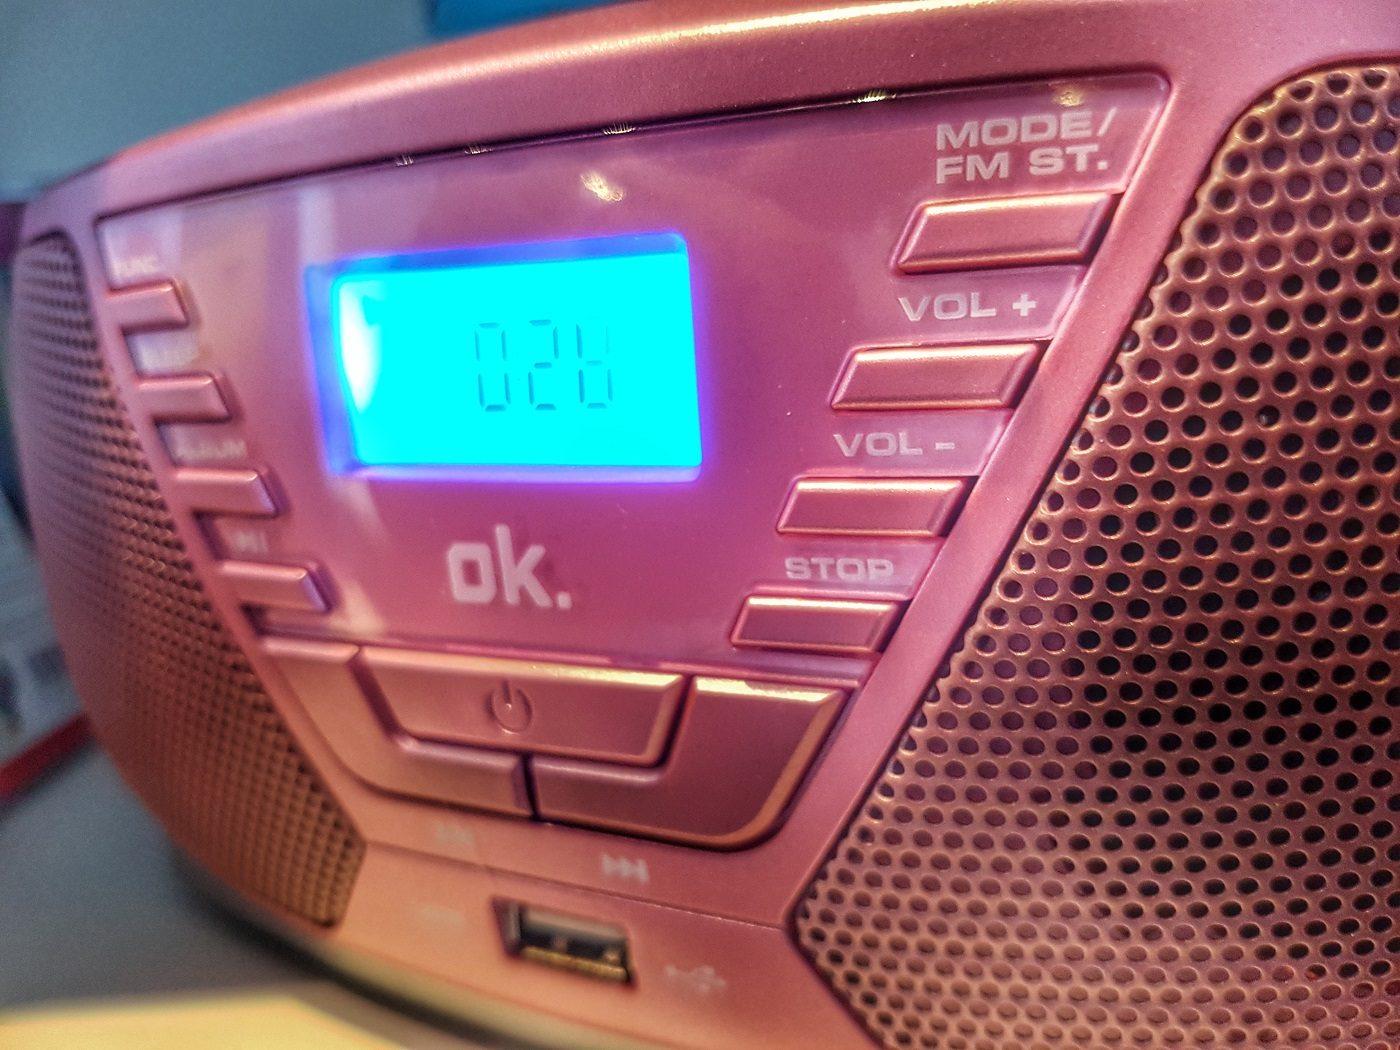 OK. ORC311 -Radiorecorder, Rosa